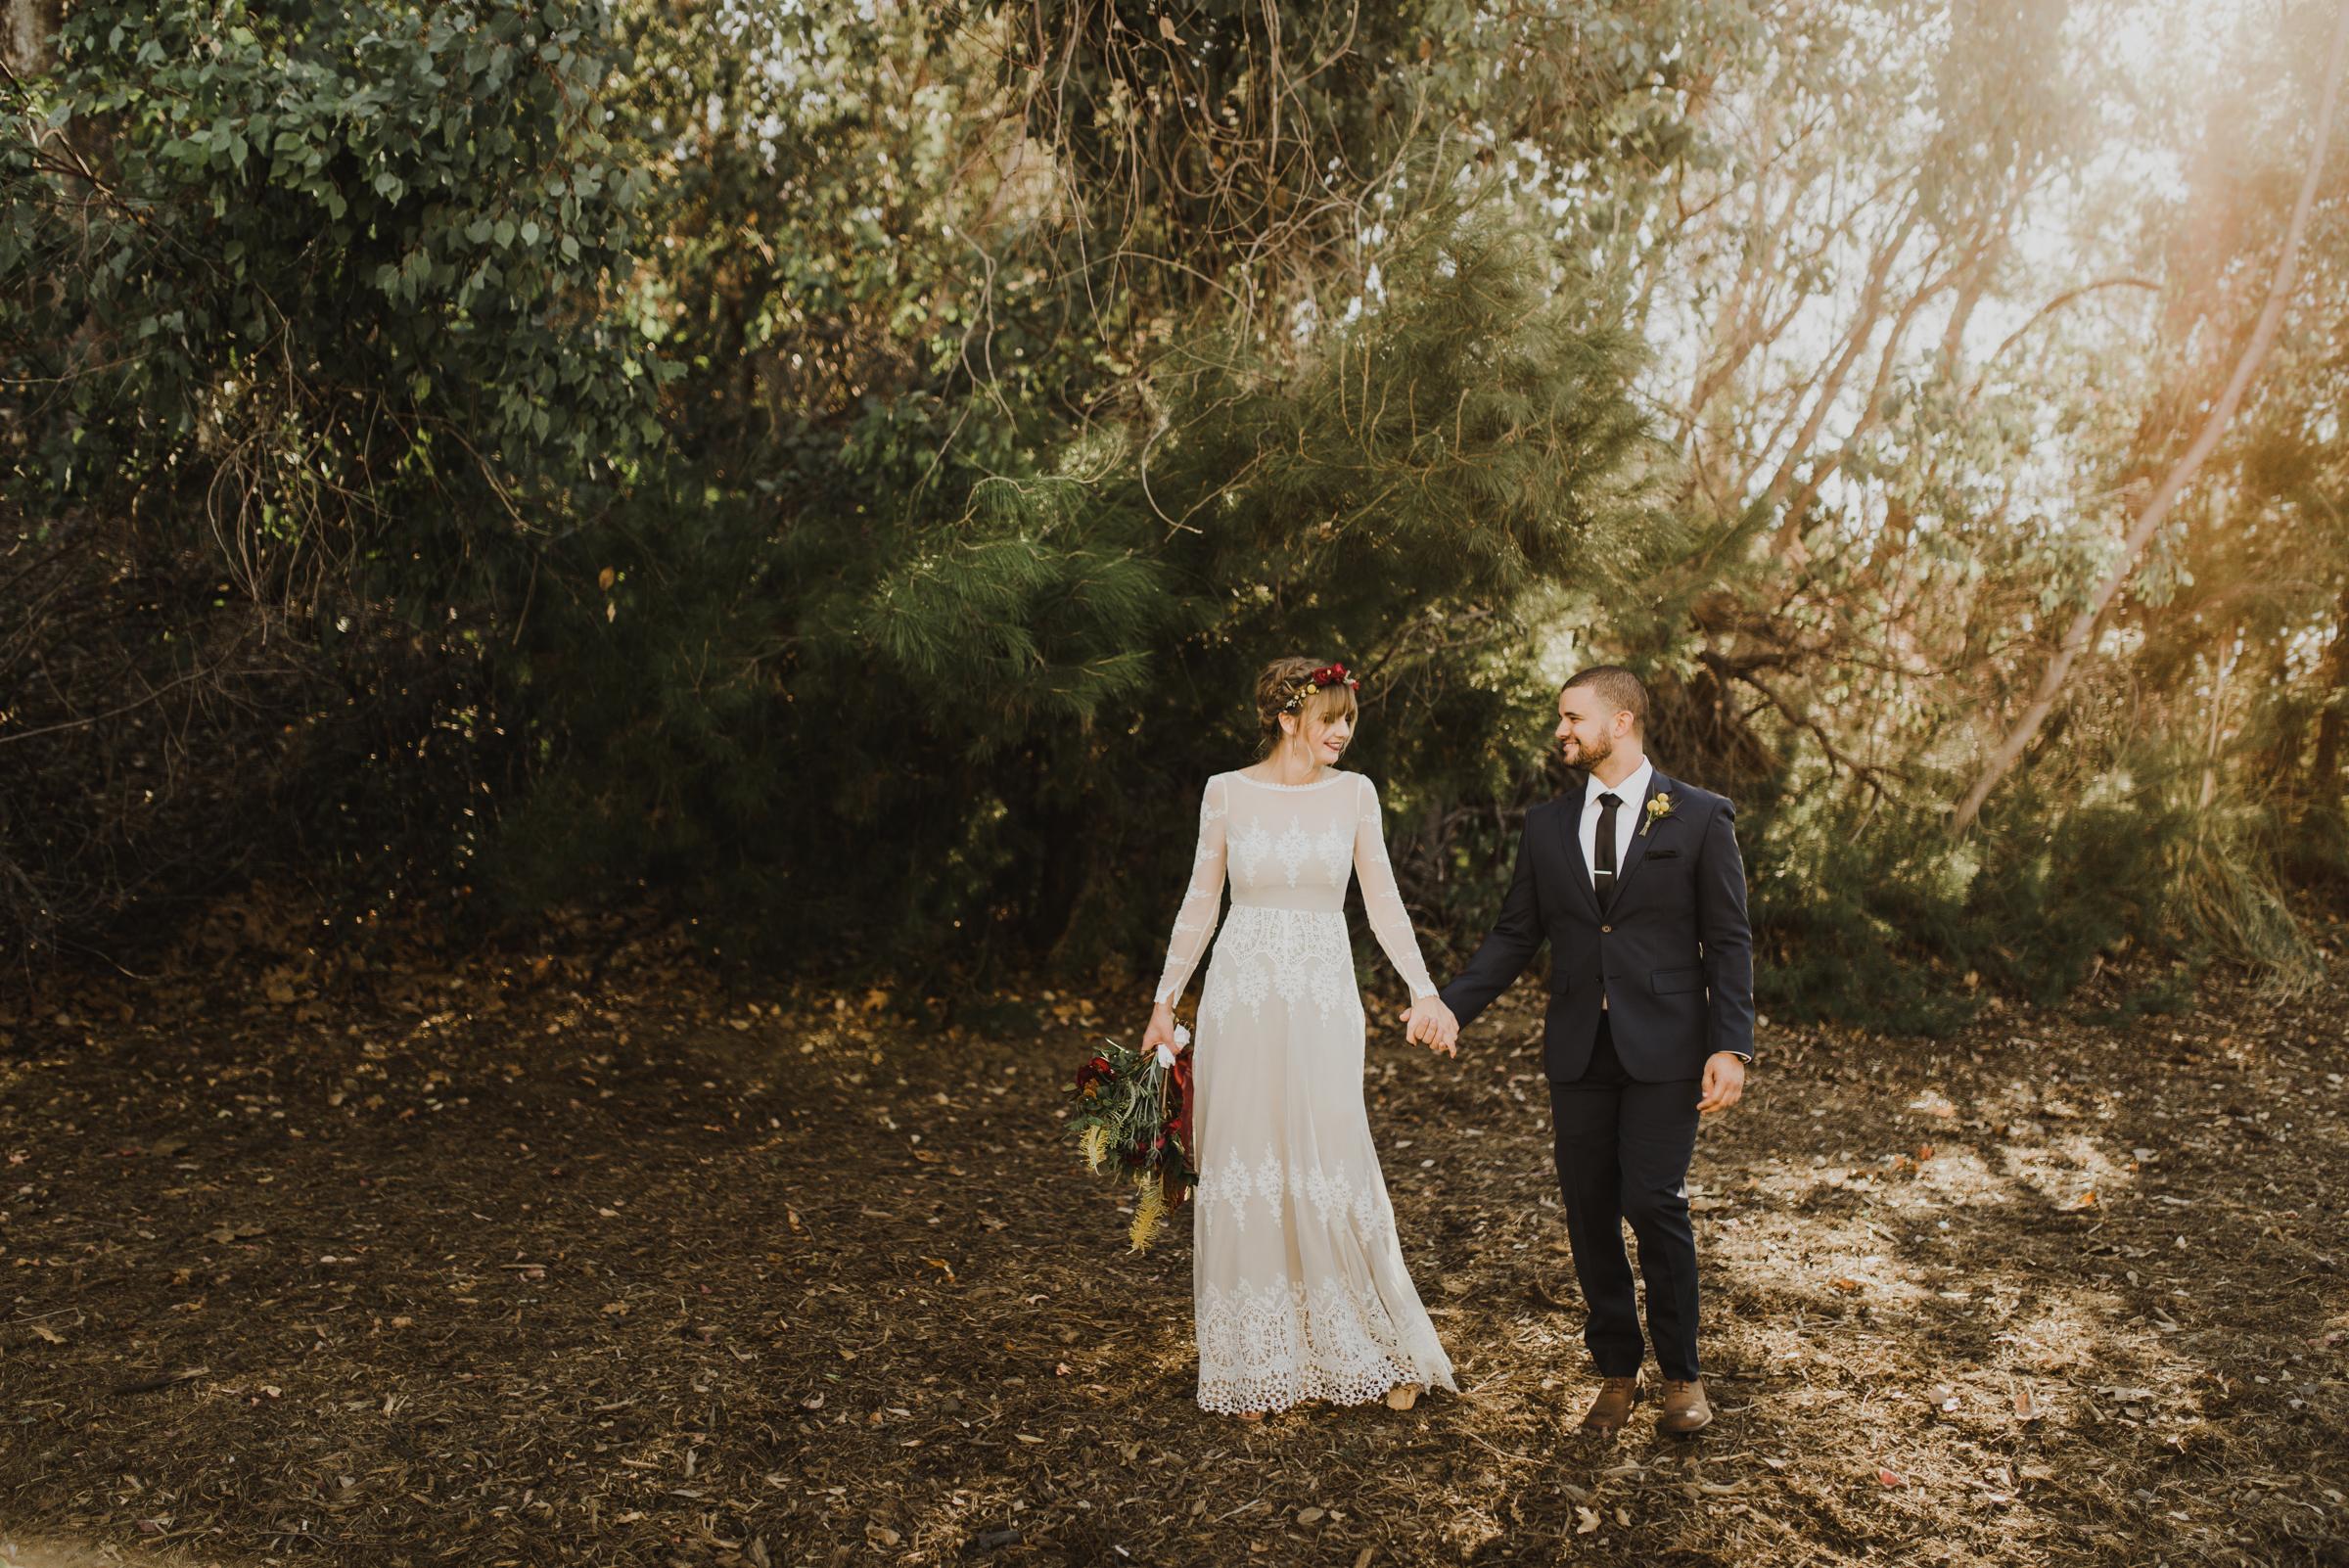 ©Isaiah + Taylor Photography - The Woodshed Booze Brothers Wedding, Vista California Wedding Photographer-44.jpg